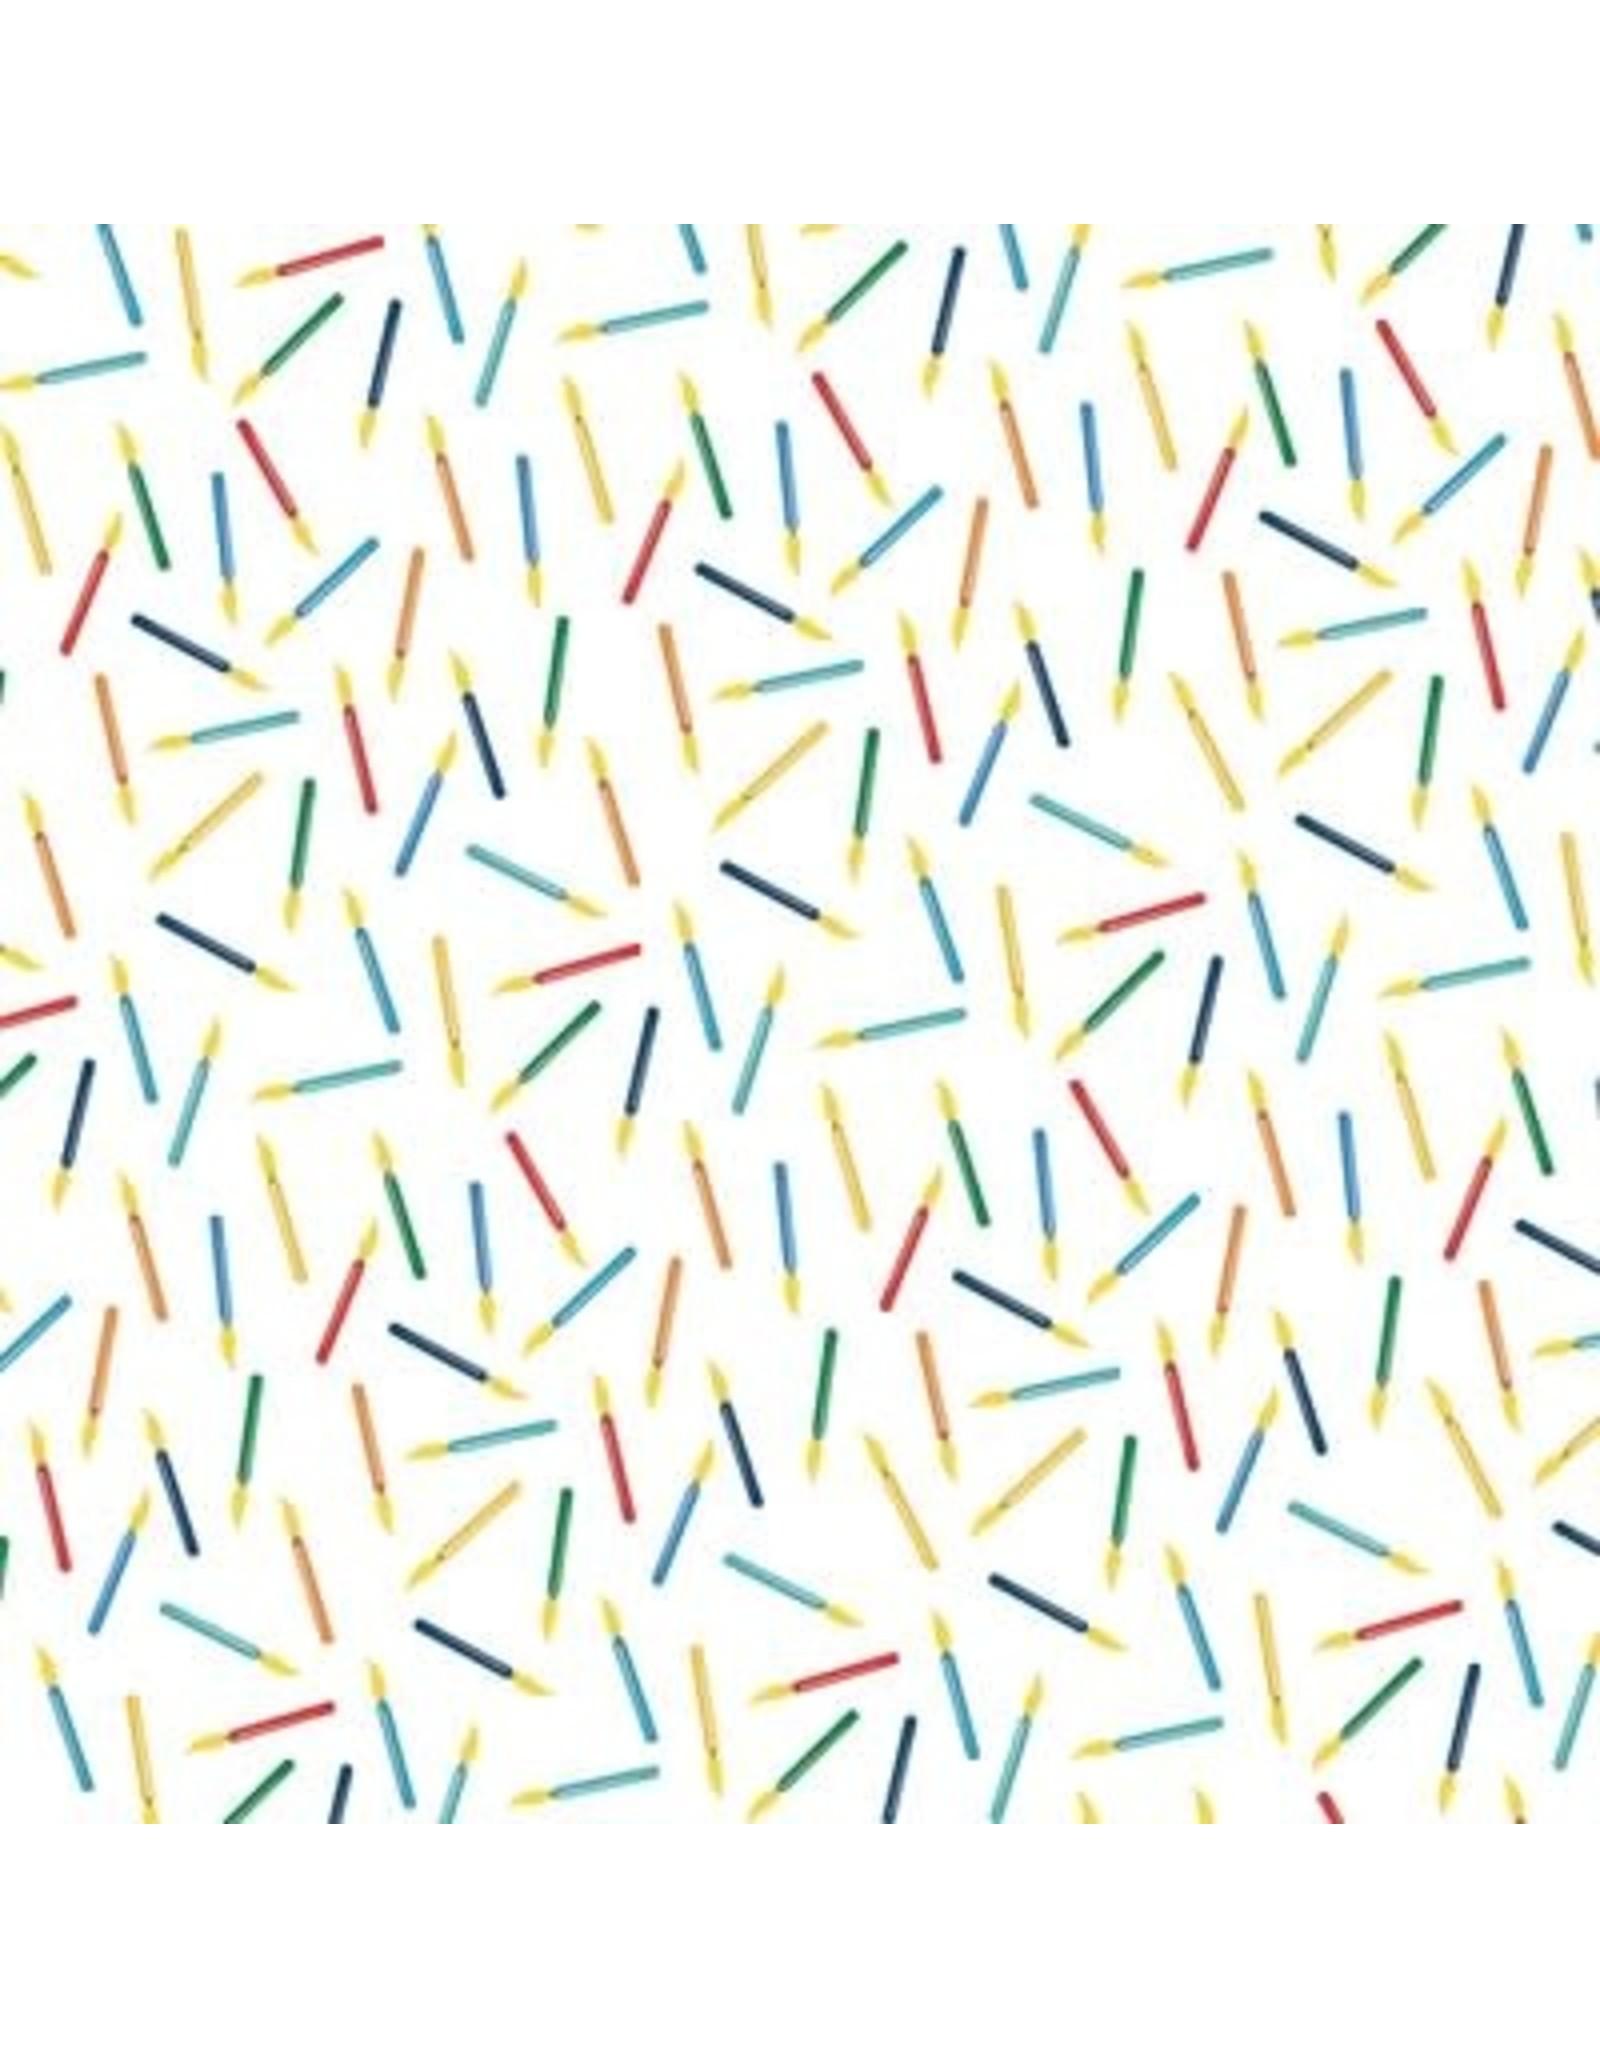 Echo Park 12X12 Patterned Paper, Let's Celebrate - Make A Wish